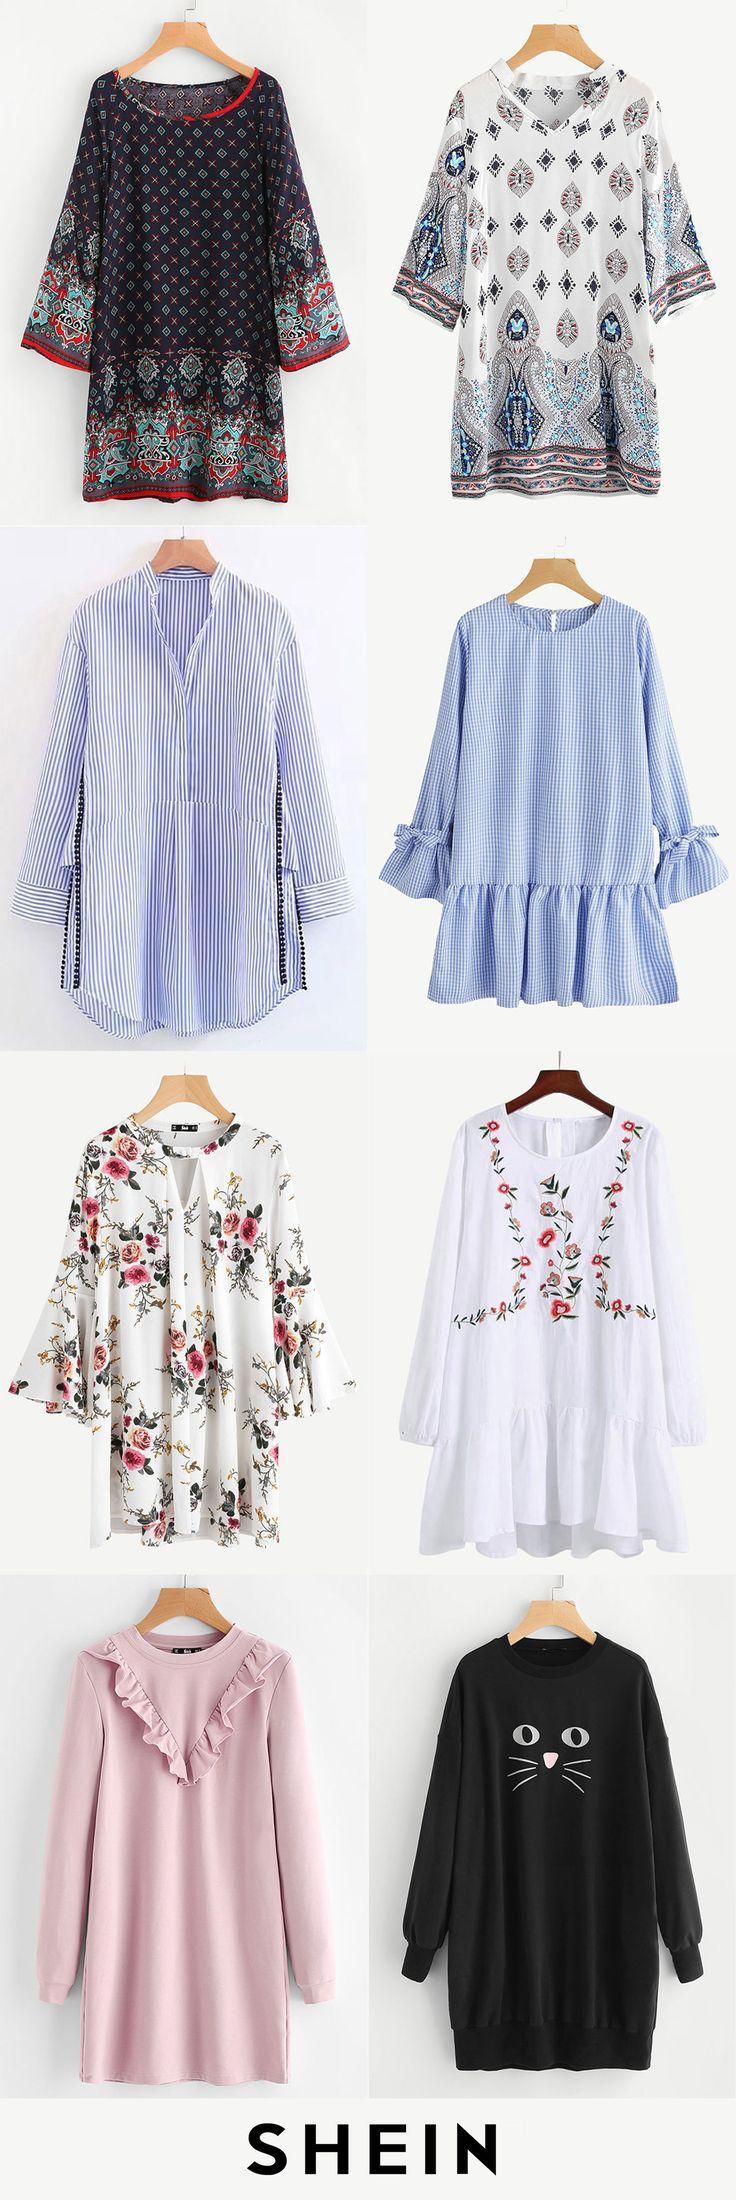 Long sleeve dresses